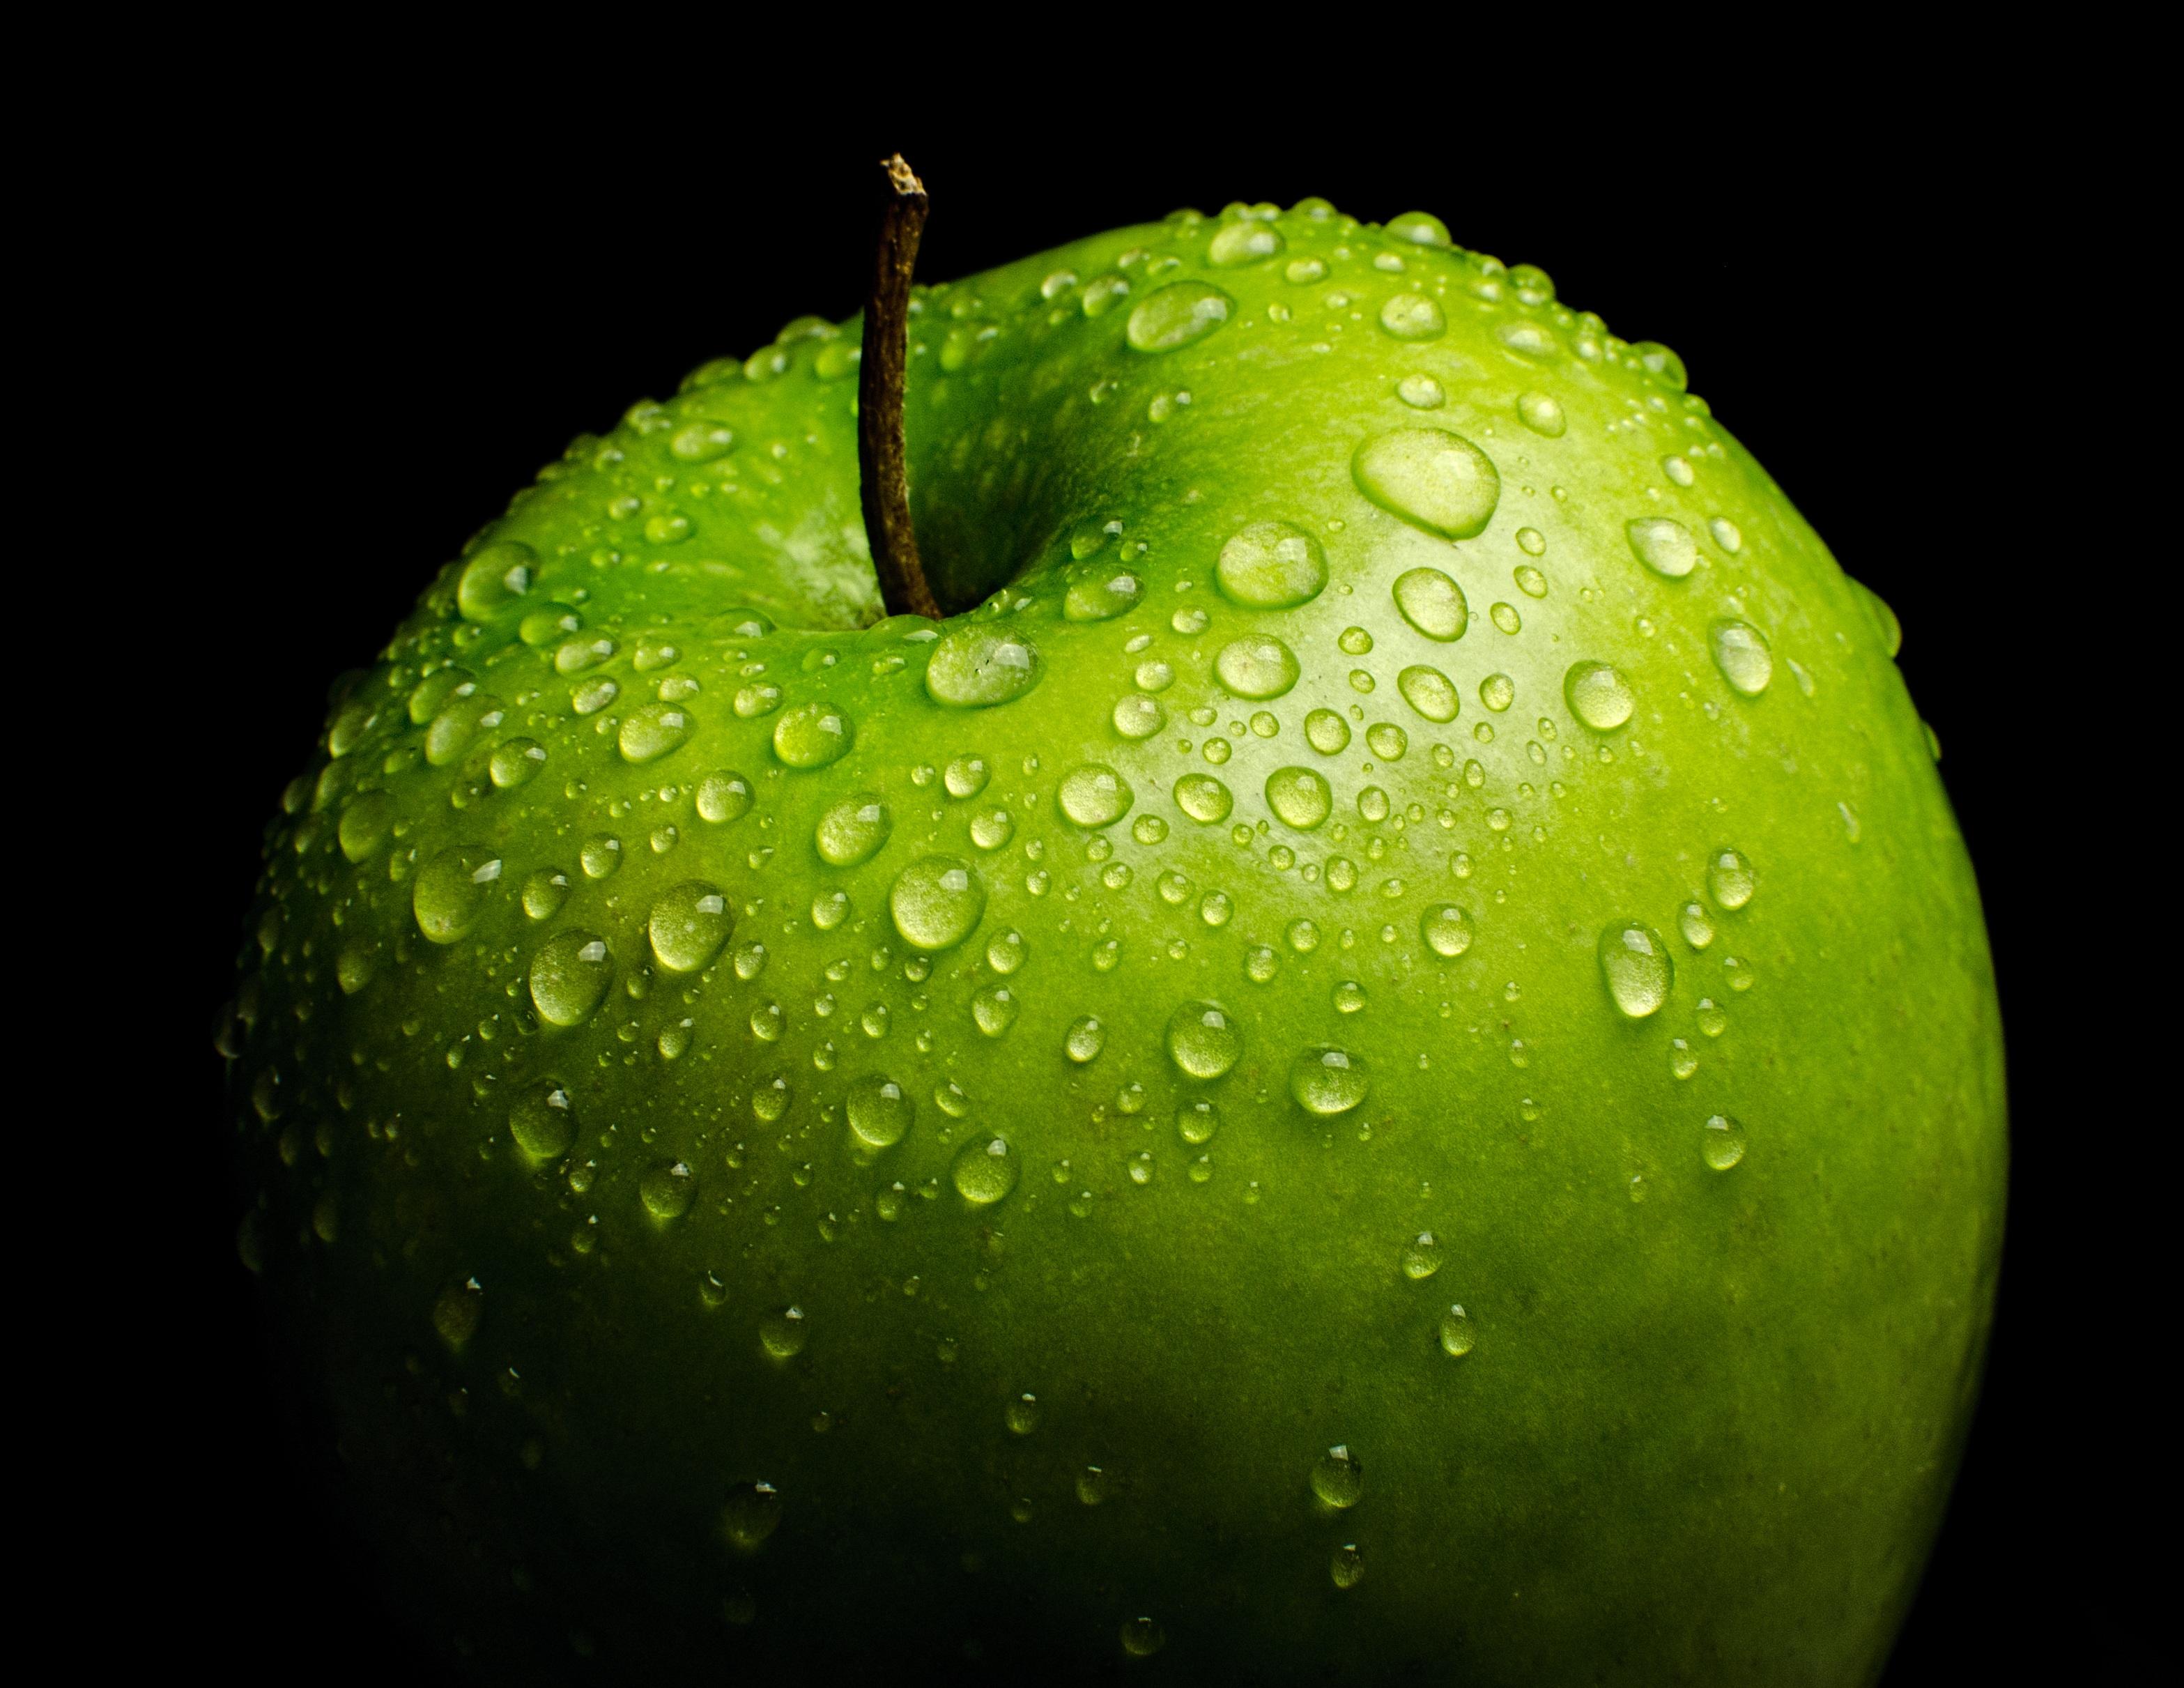 Free Images : Drop, Fruit, Leaf, Food, Green, Produce